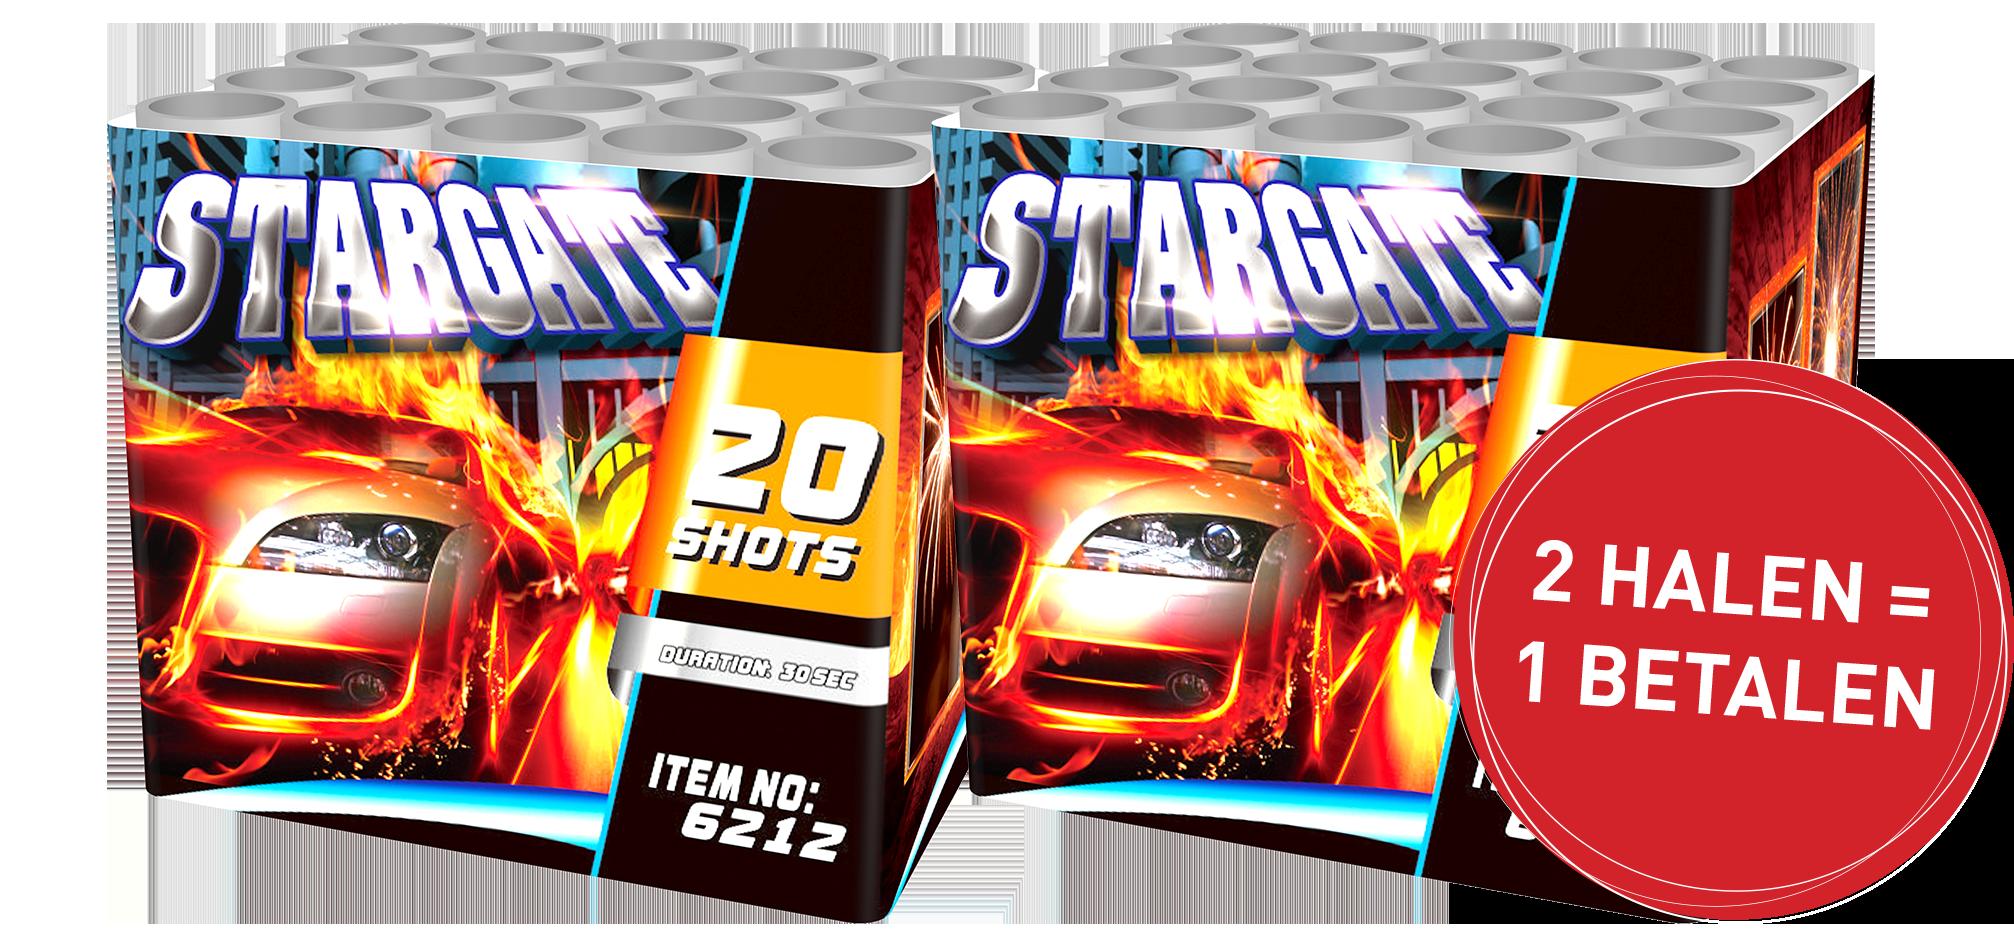 Stargate 2 halen = 1 betalen!